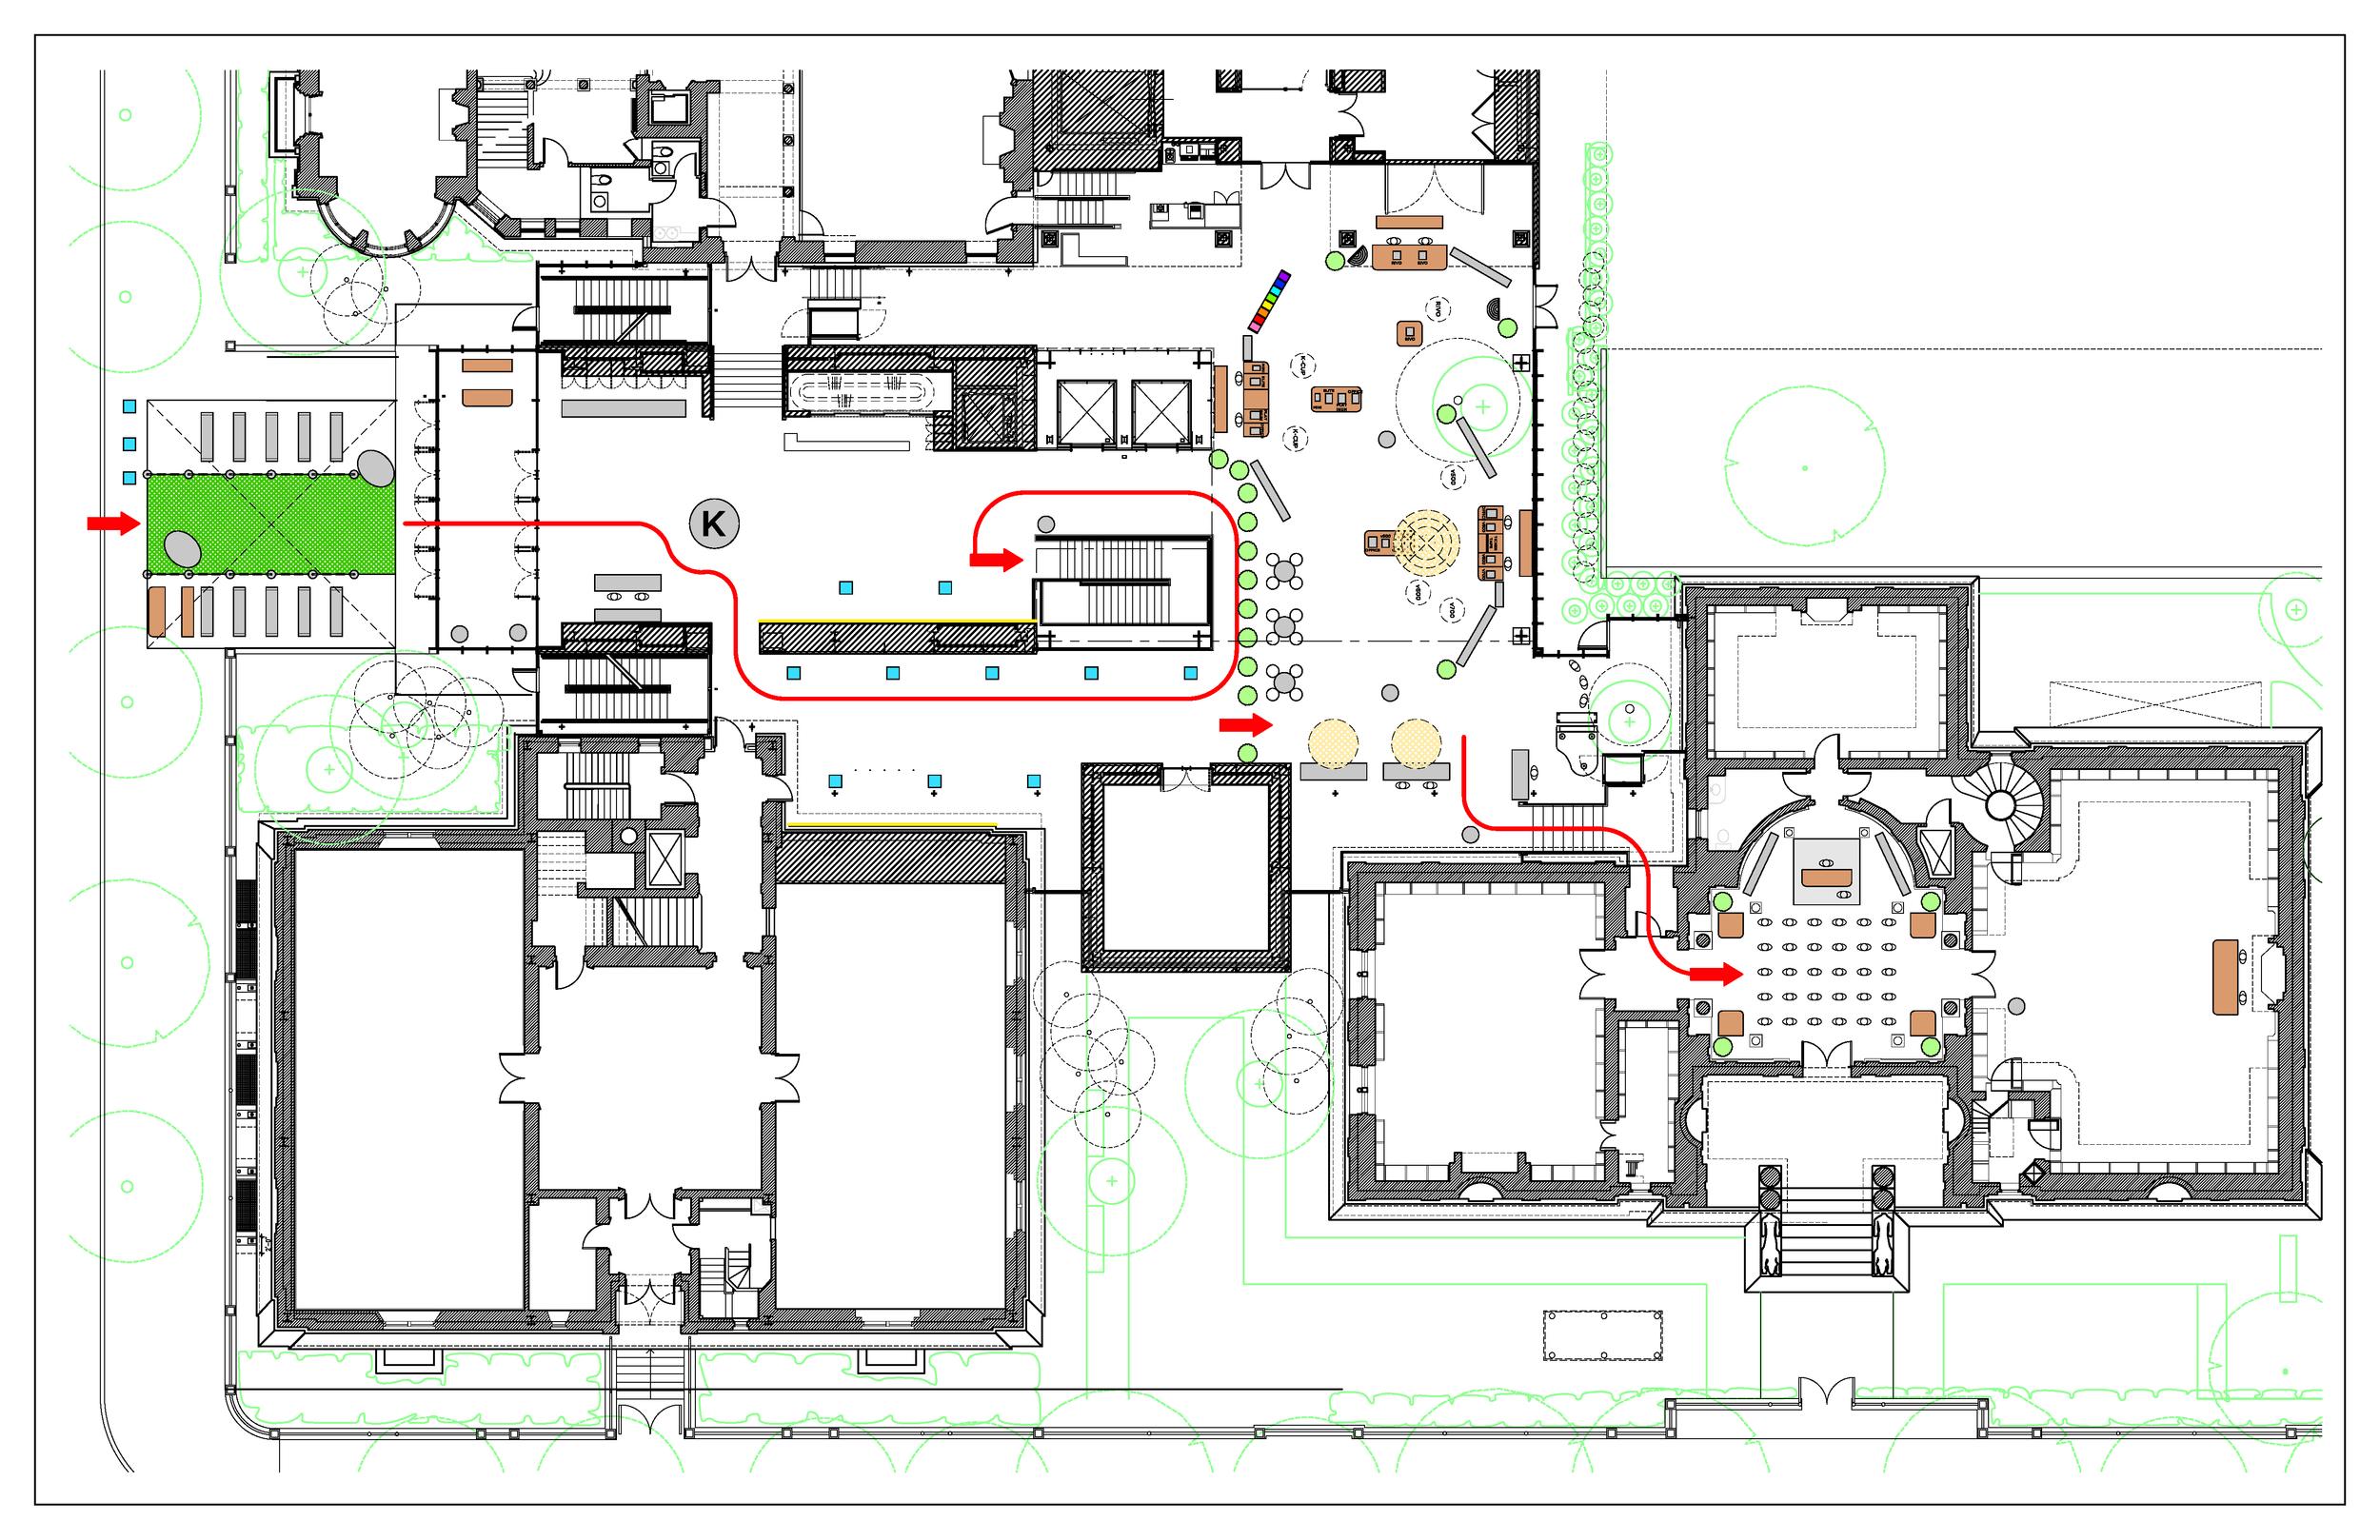 "Keurig Green Mountain: ""15 Years of Innovation & Engineering"" - full ground plan"